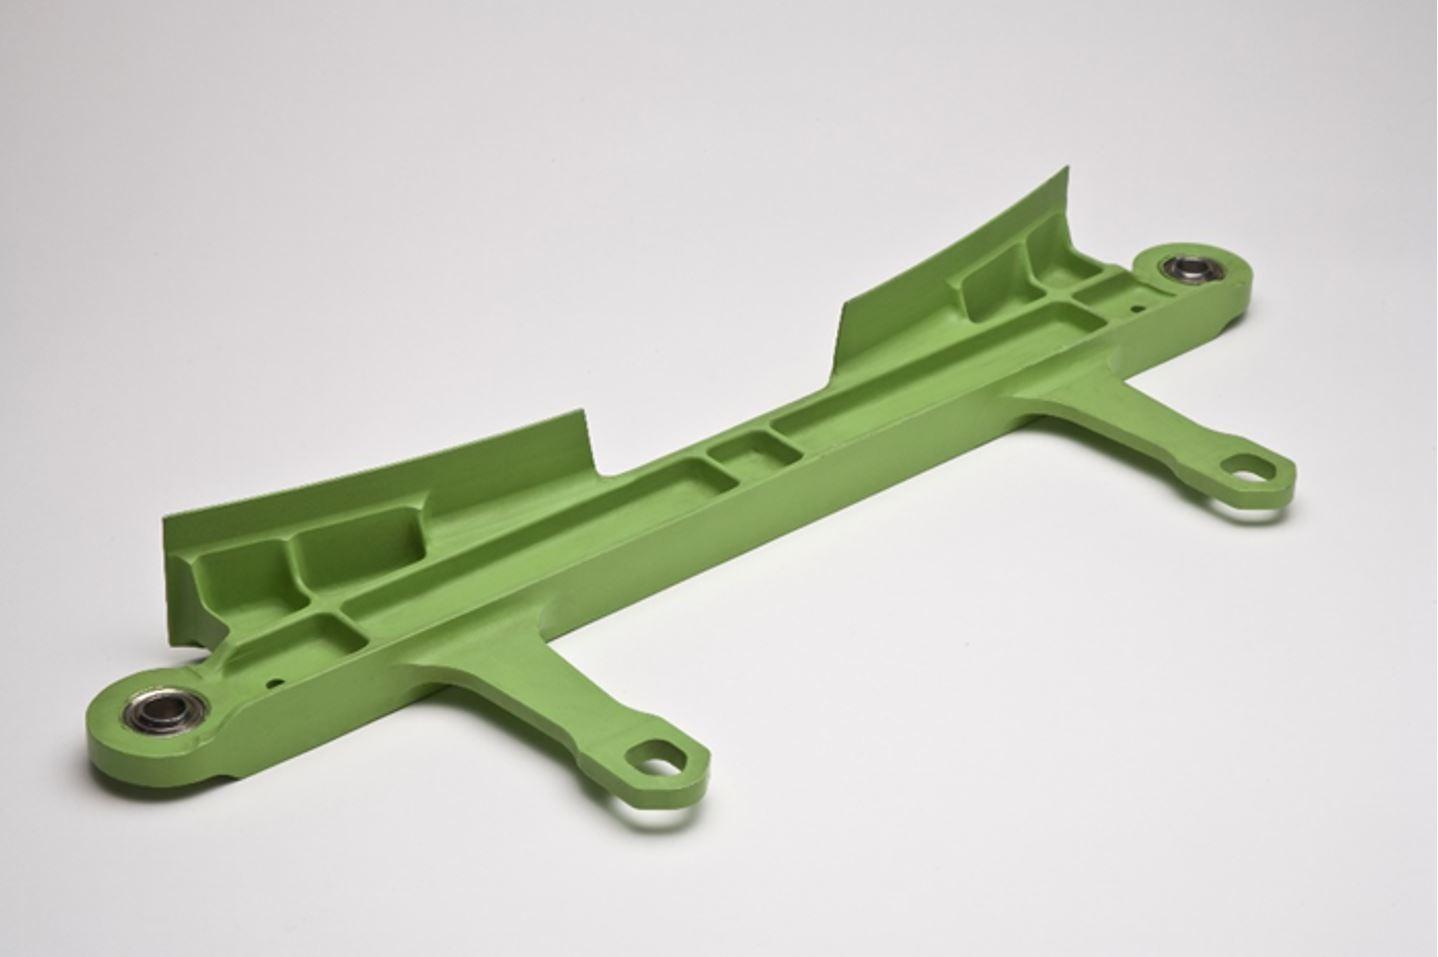 SIFCO, Orange, Aero Structural, V2500 Nacelle, Aluminum